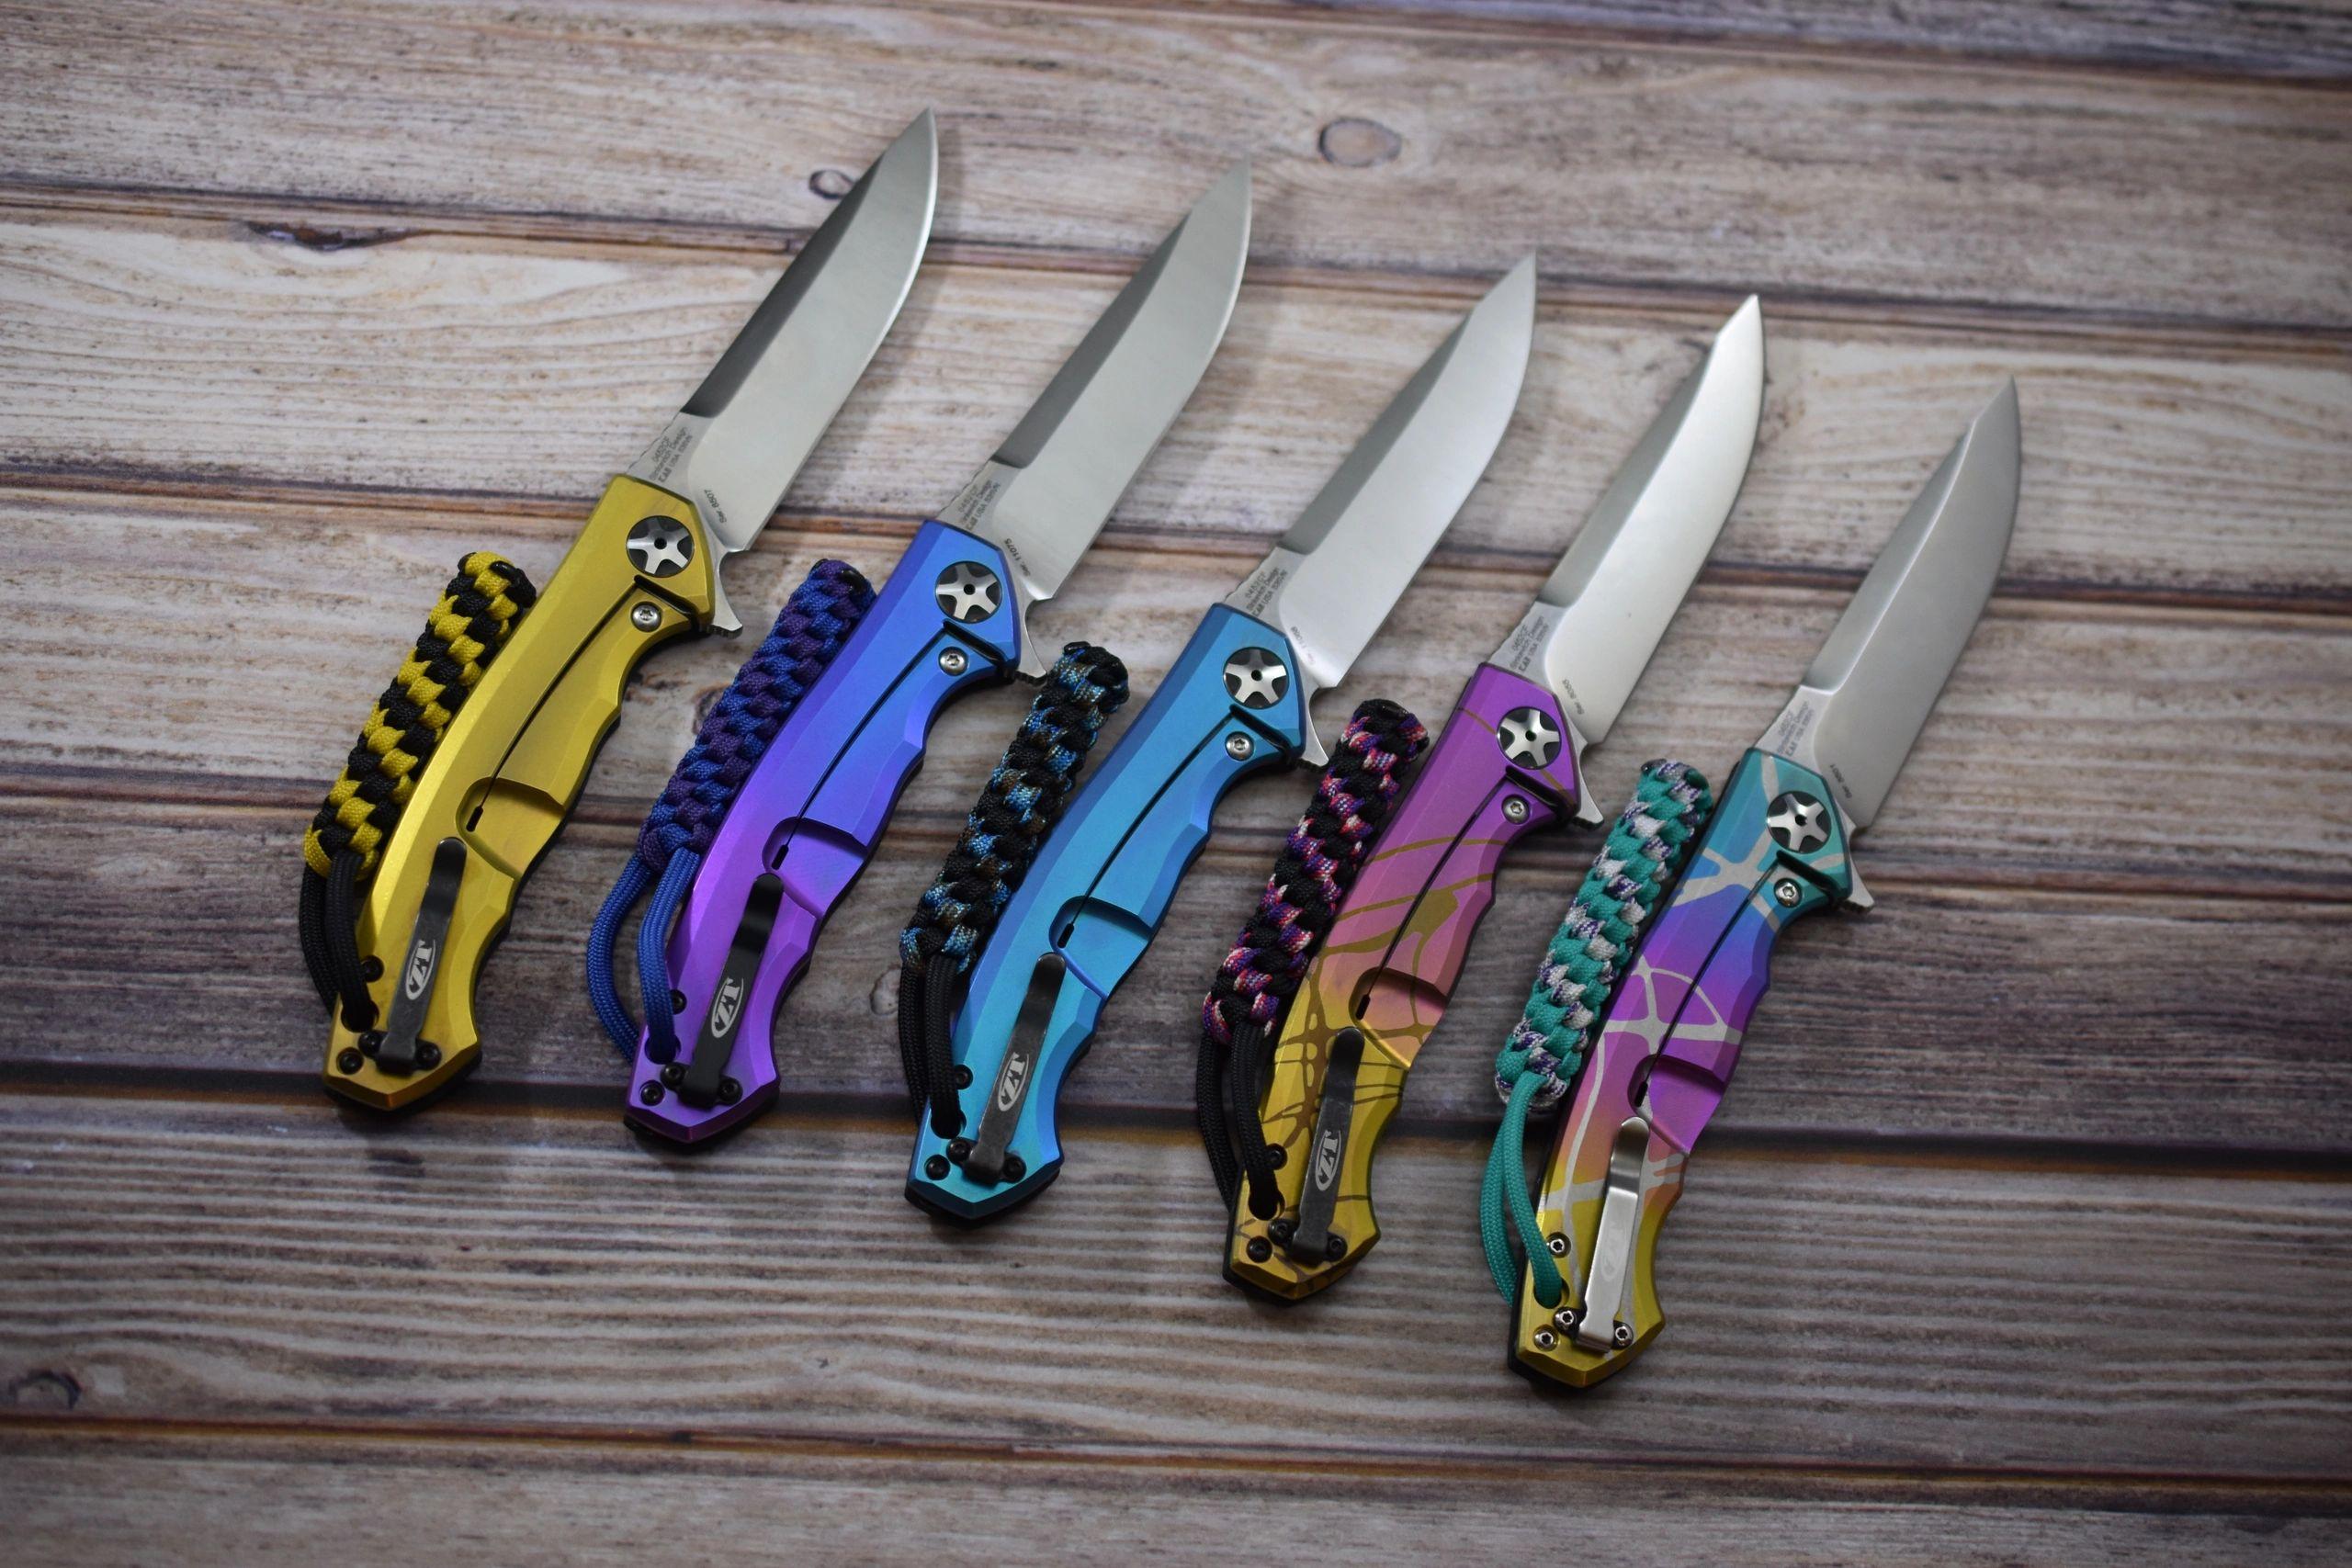 JD Cutlery - Anodized Knives, Reate Knives, Zero Tolerance